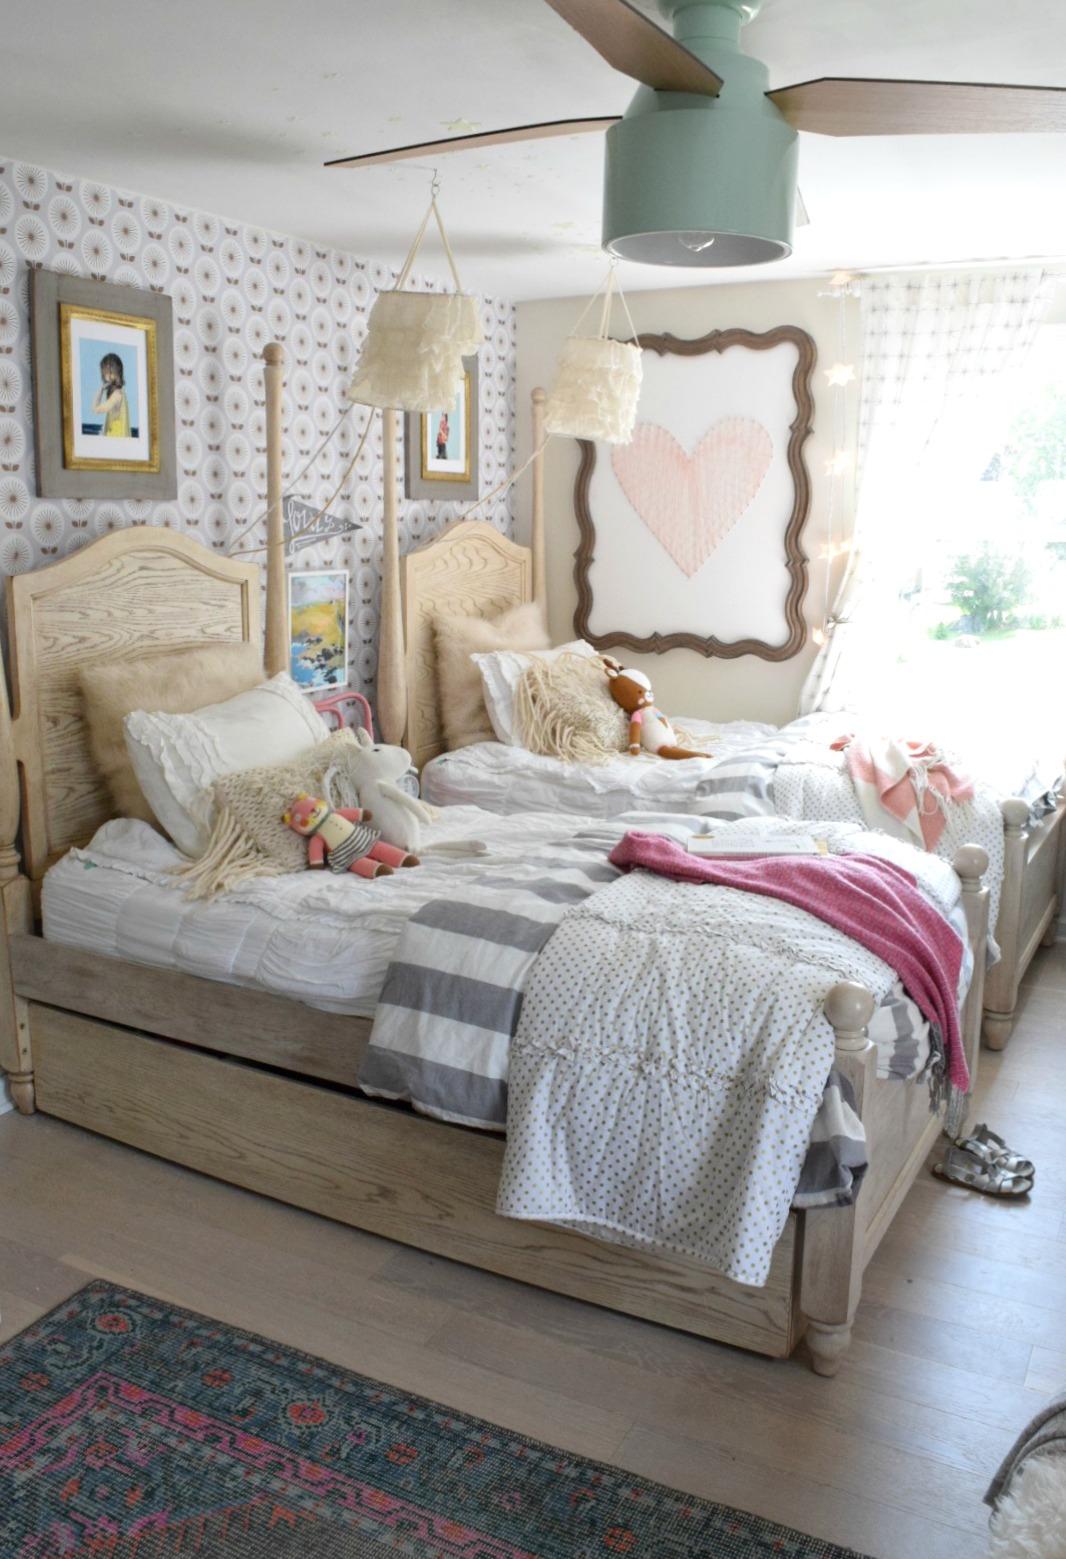 Teenage Girl Shared Bedroom Ideas 1066x1559 Download Hd Wallpaper Wallpapertip